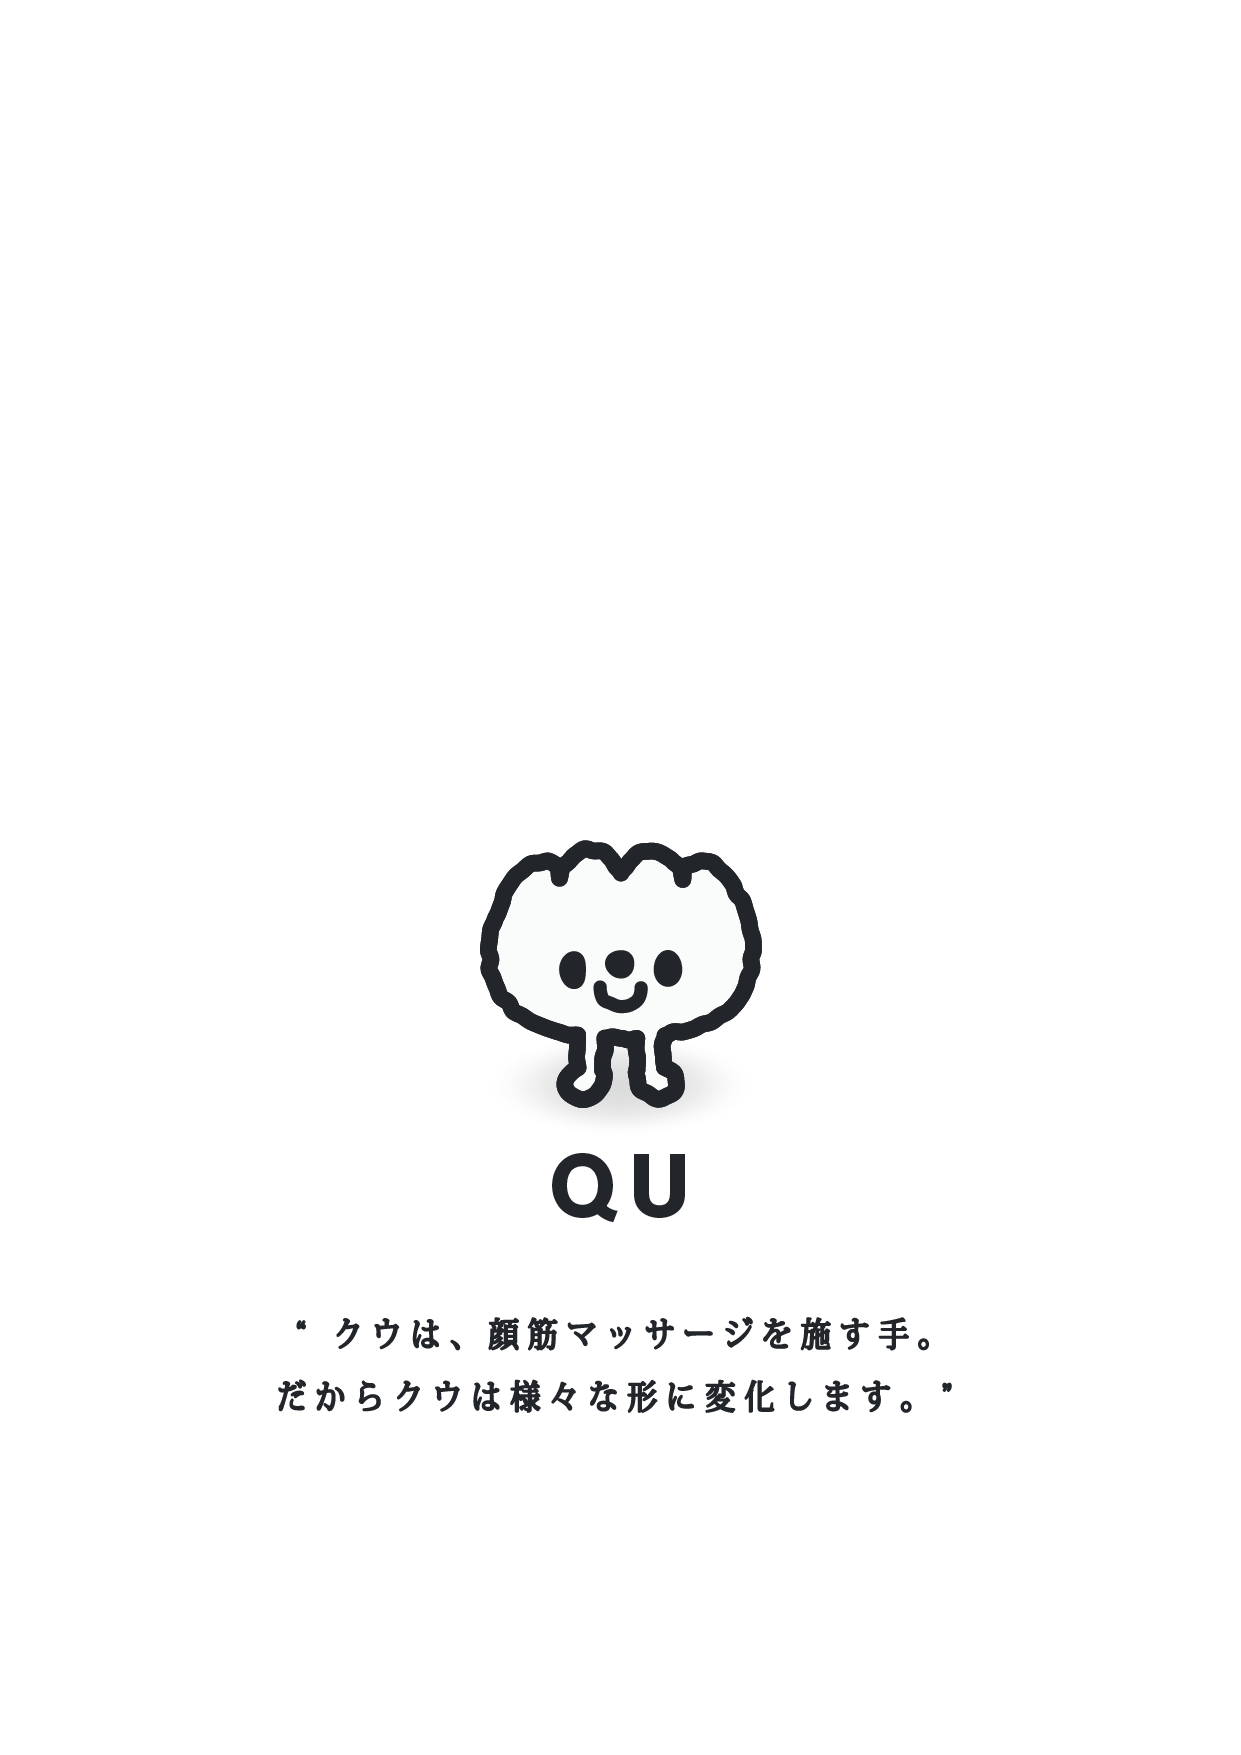 suqqu-present-DATA-07.png